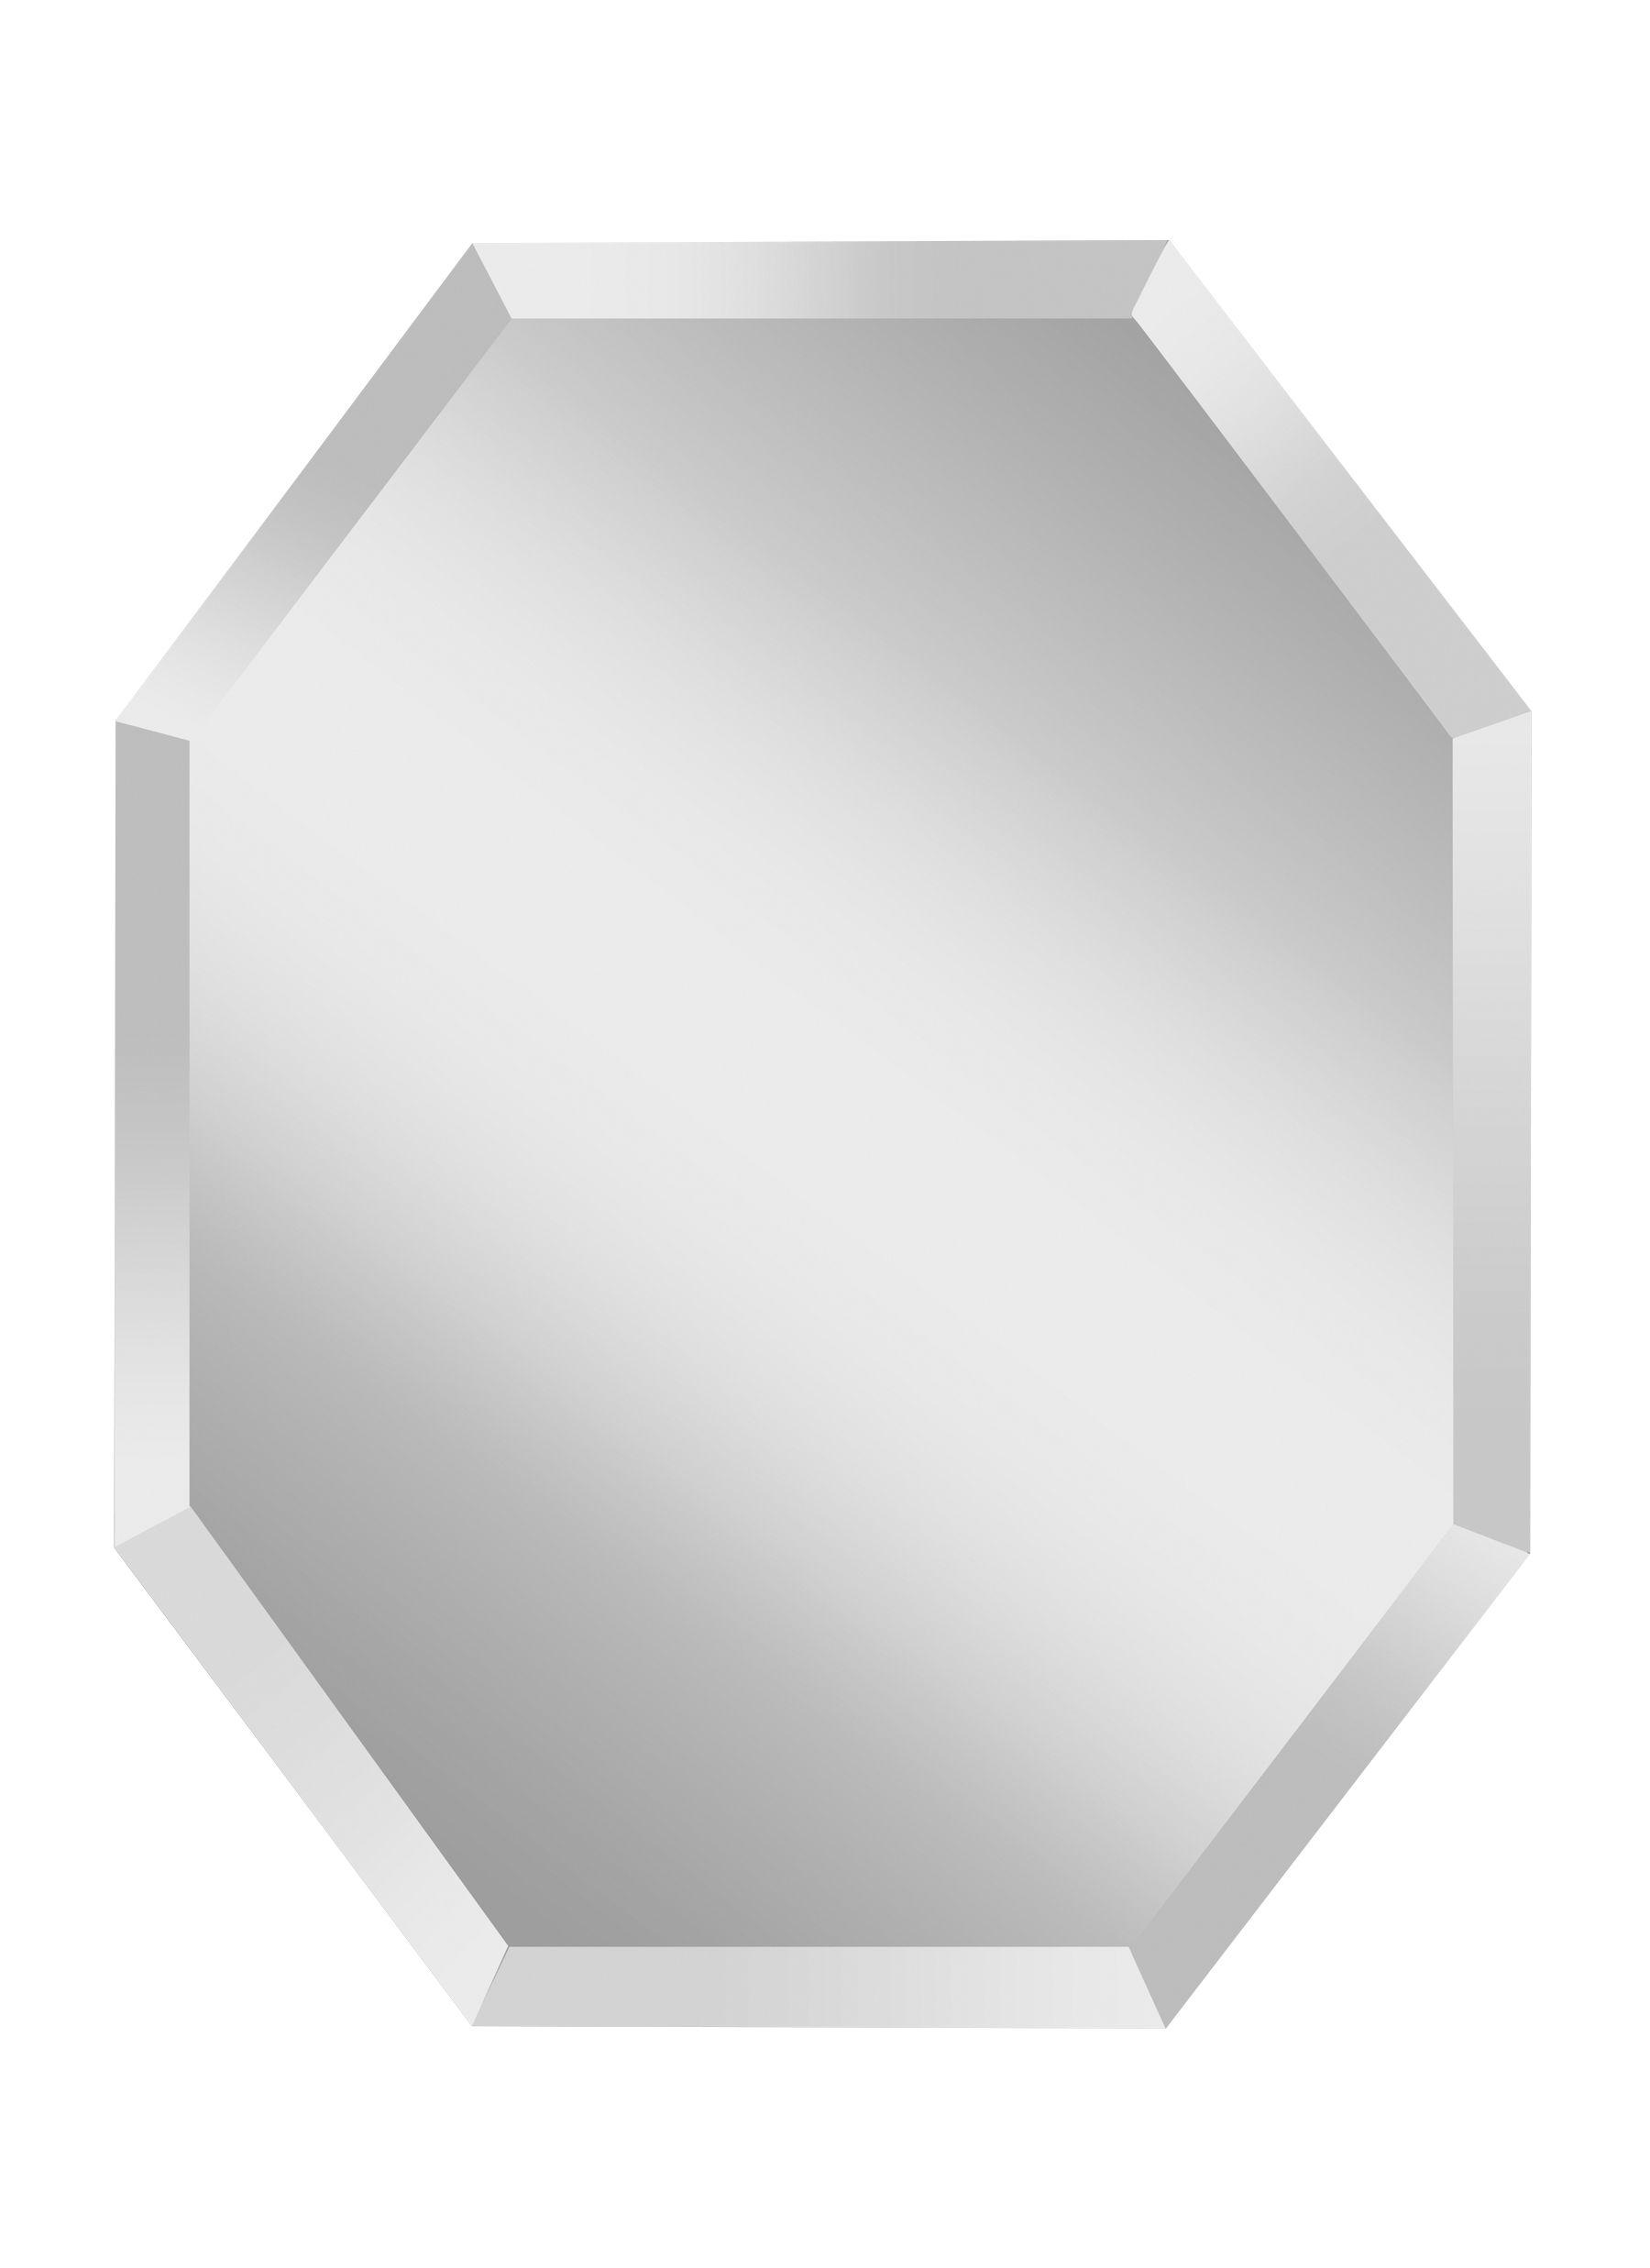 Infinity Frameless Wall Mirror | http://drrw.us | Pinterest ...